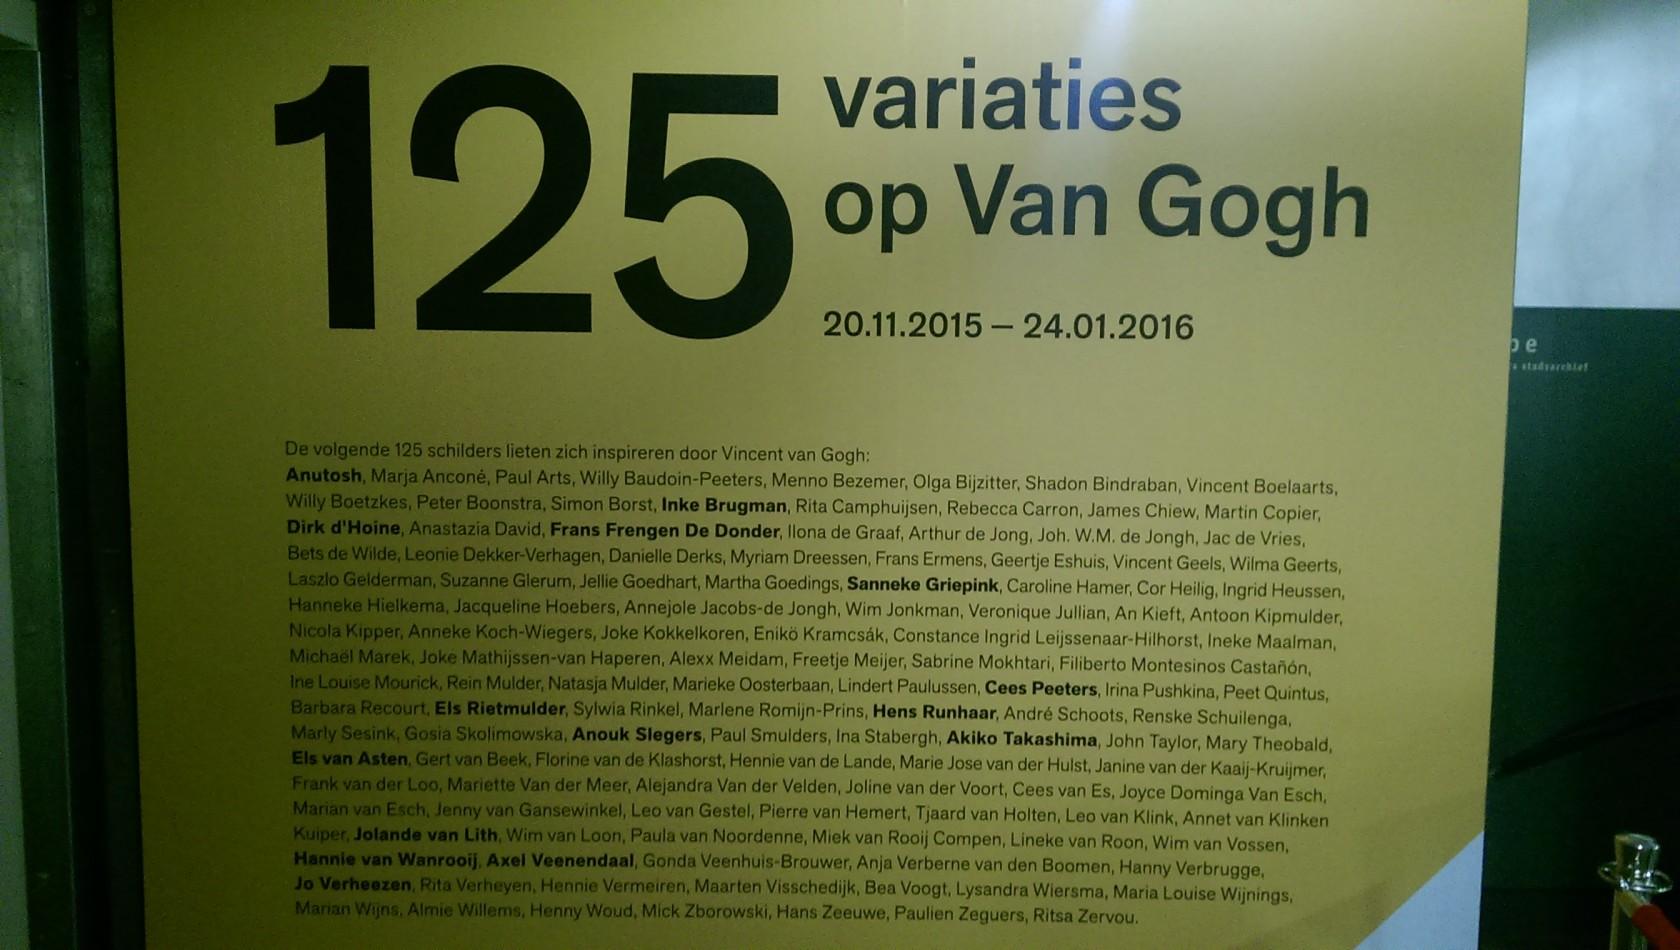 125 Variaties op Van Gogh